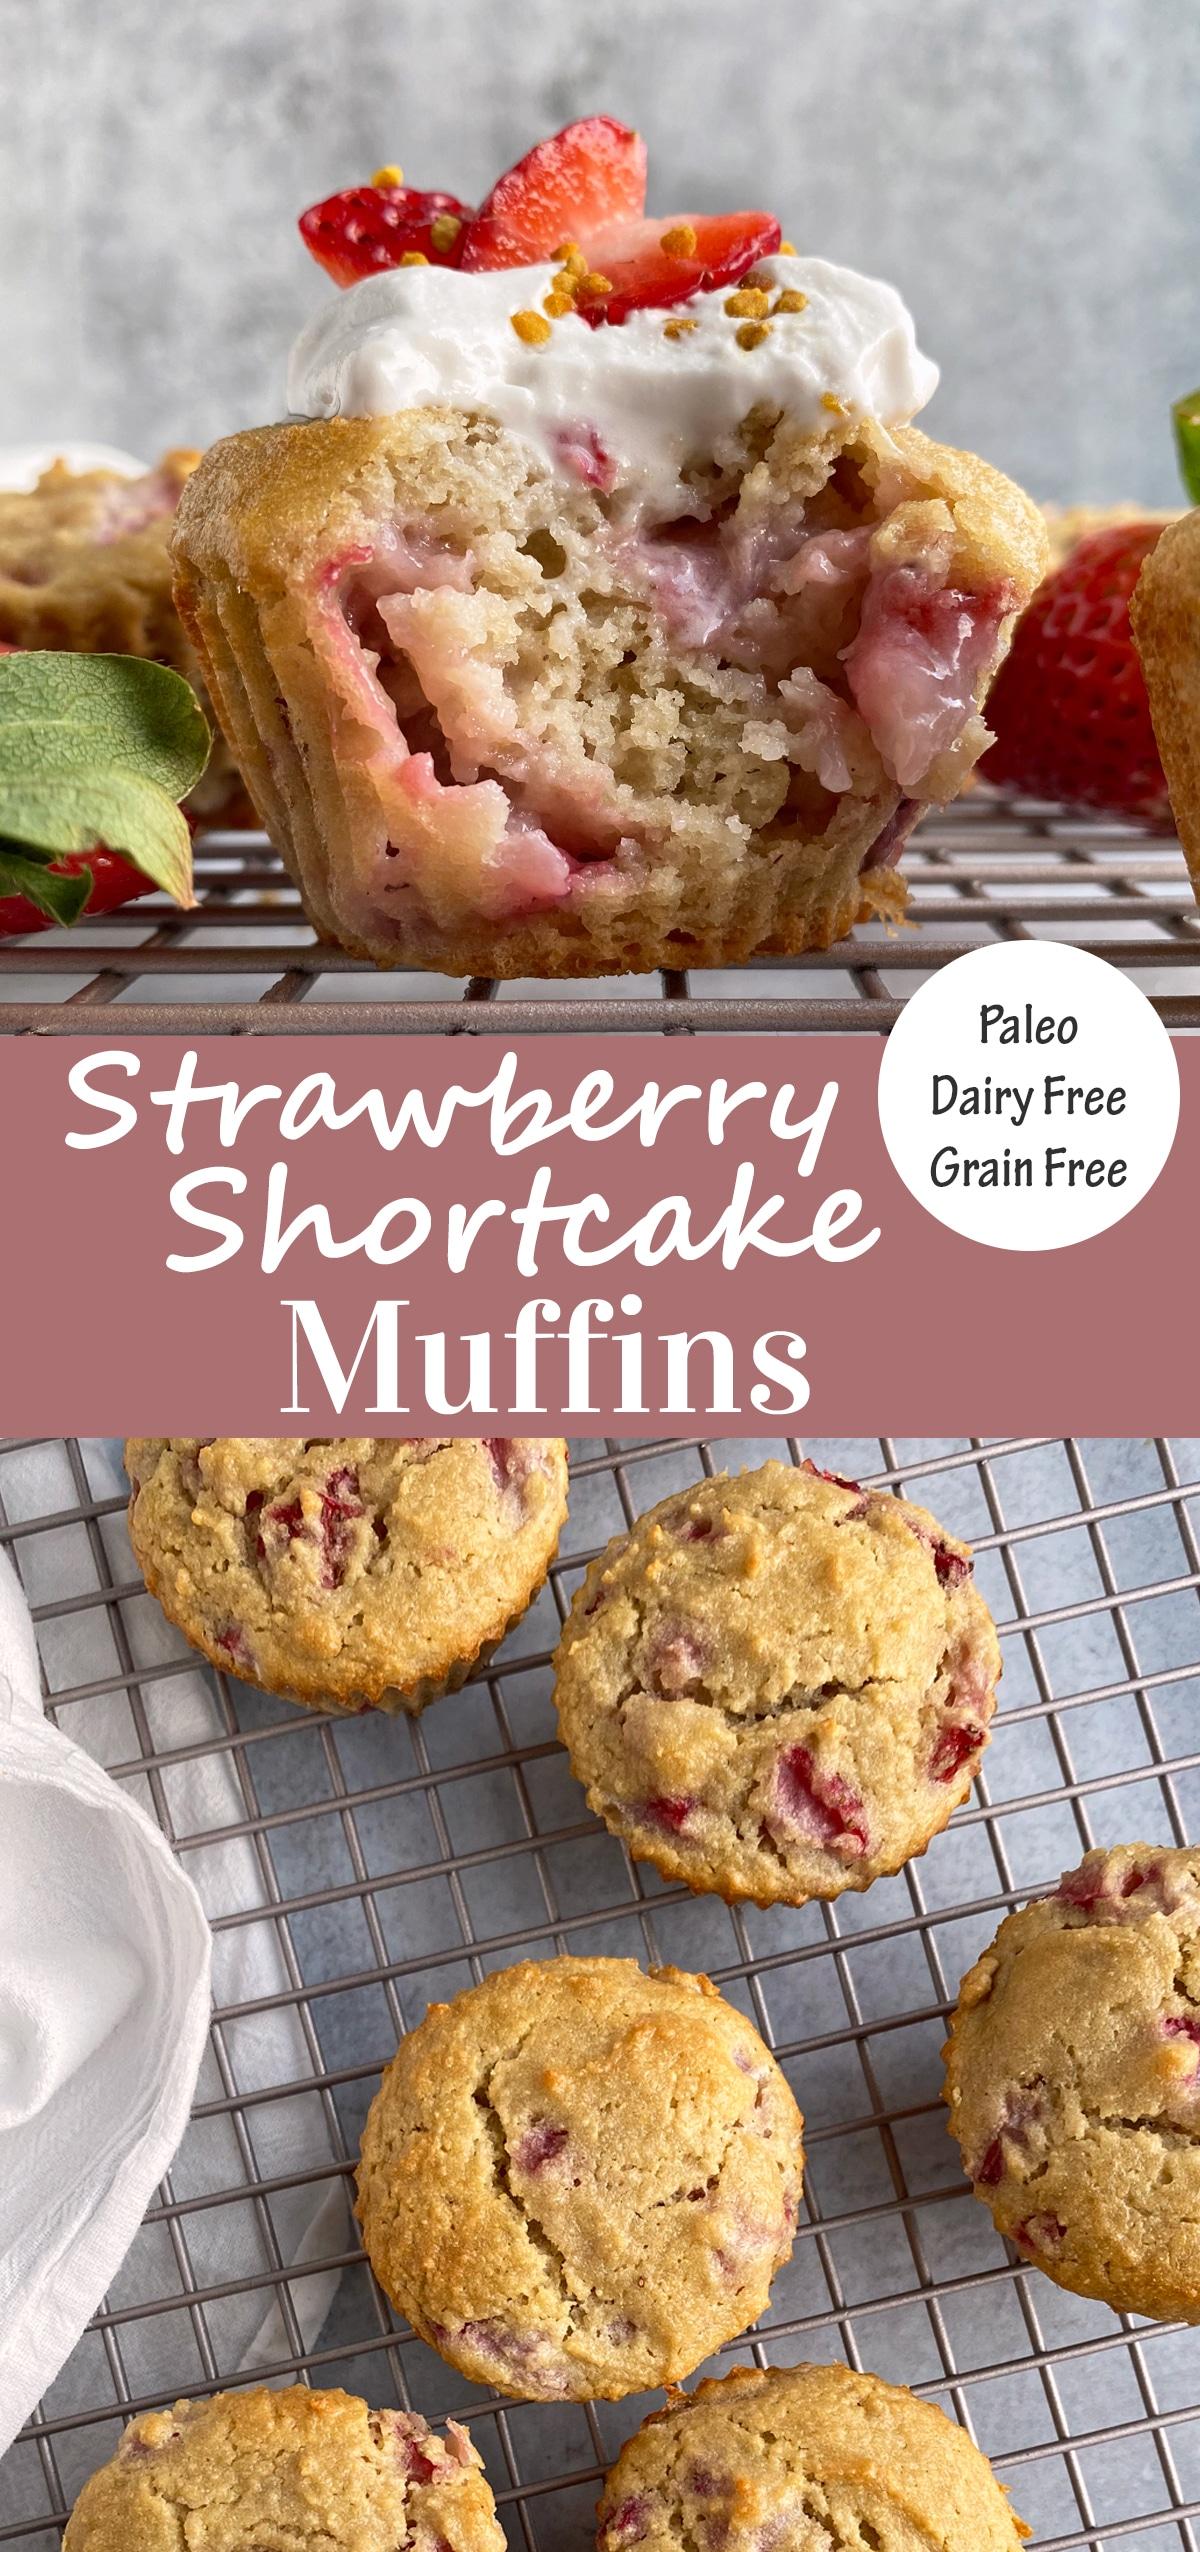 strawberry-shortcake-paleo-muffins-pinterest-image